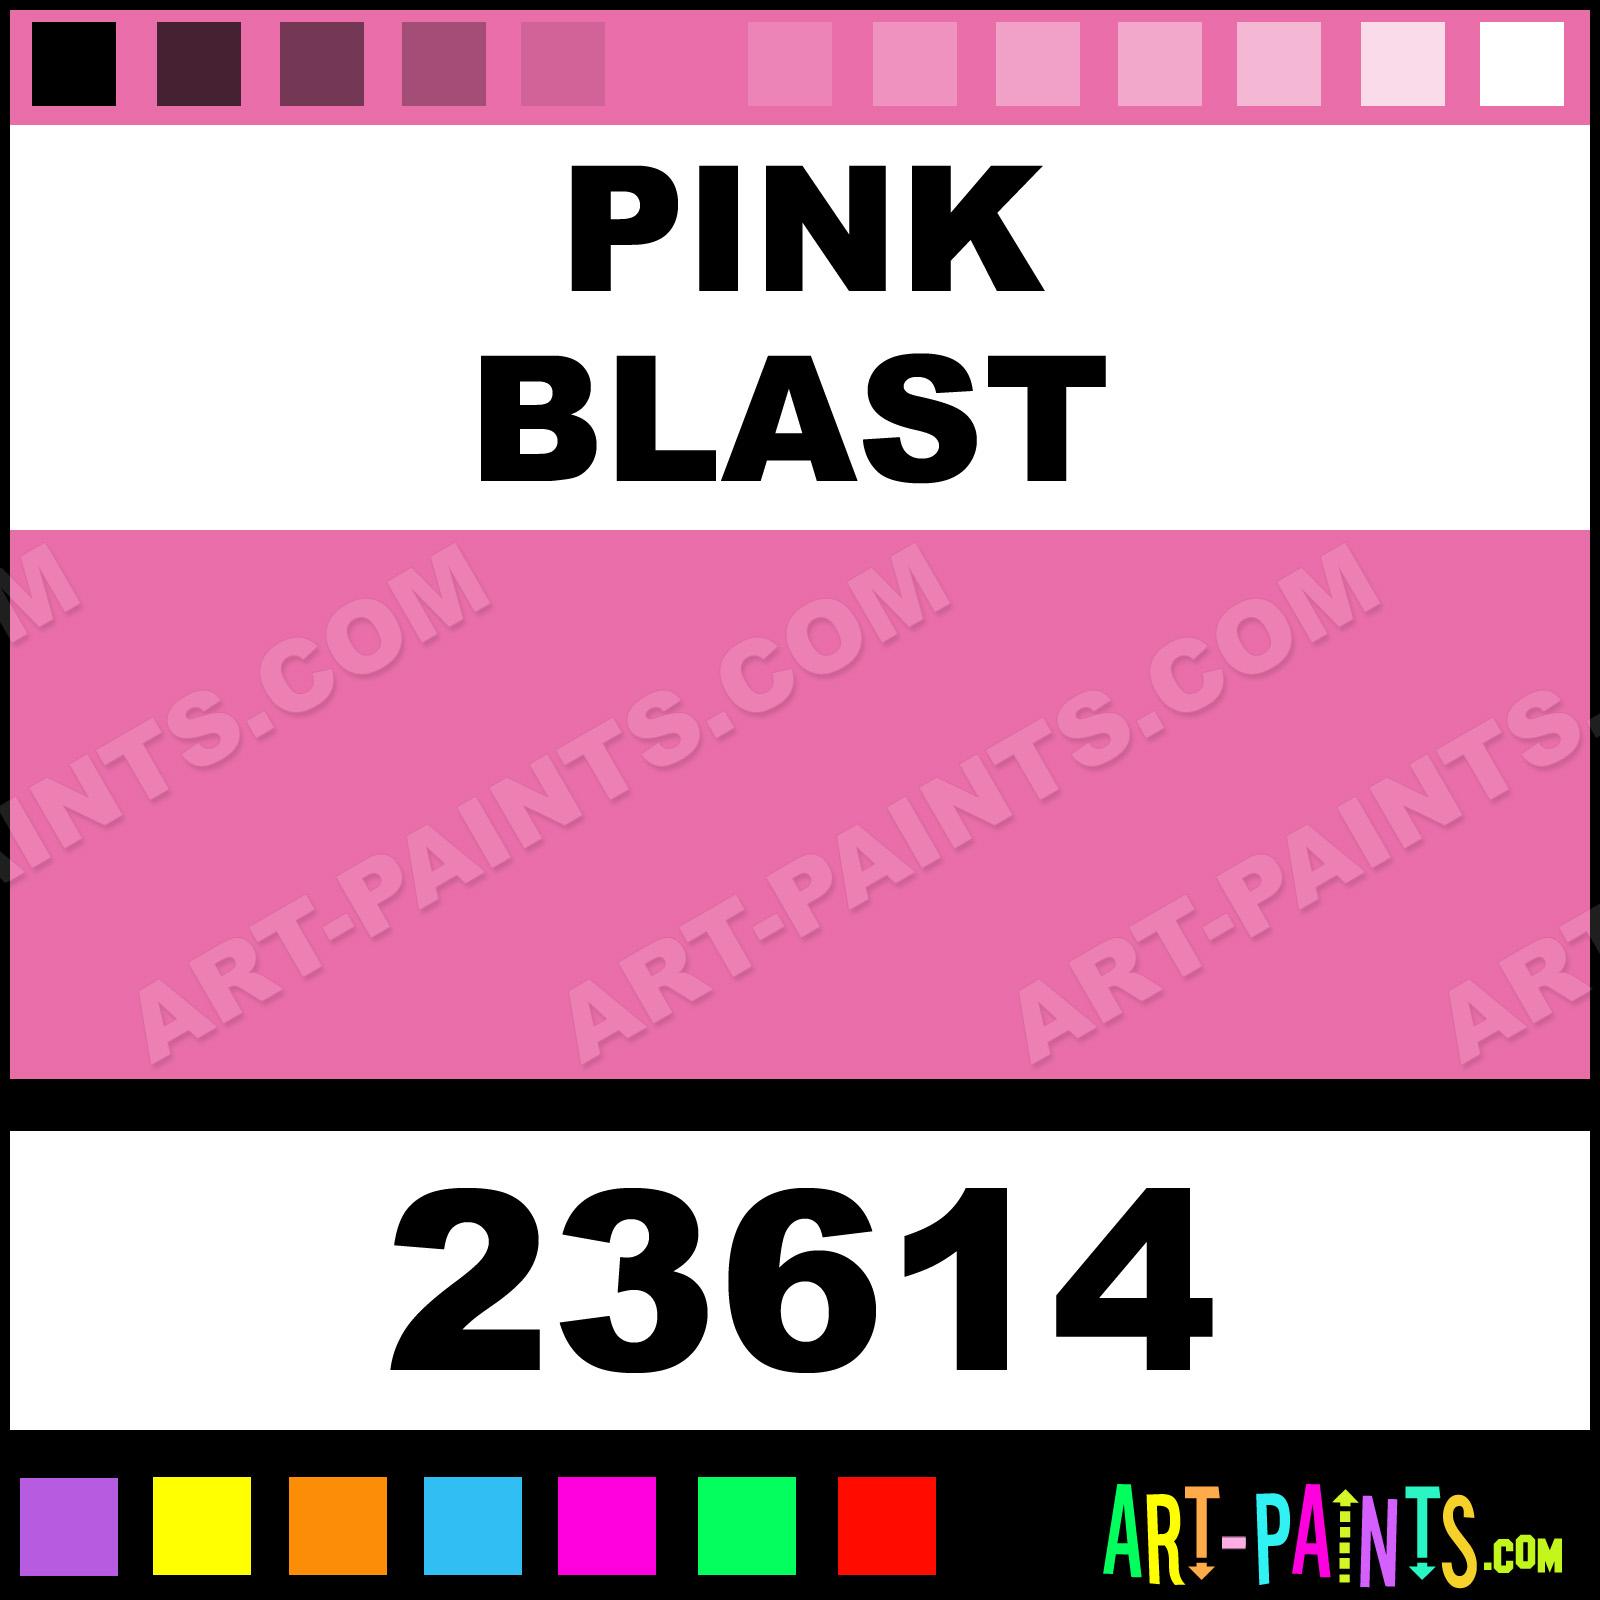 Pink blast craft smart acrylic paints 23614 pink blast paint pink blast nvjuhfo Choice Image